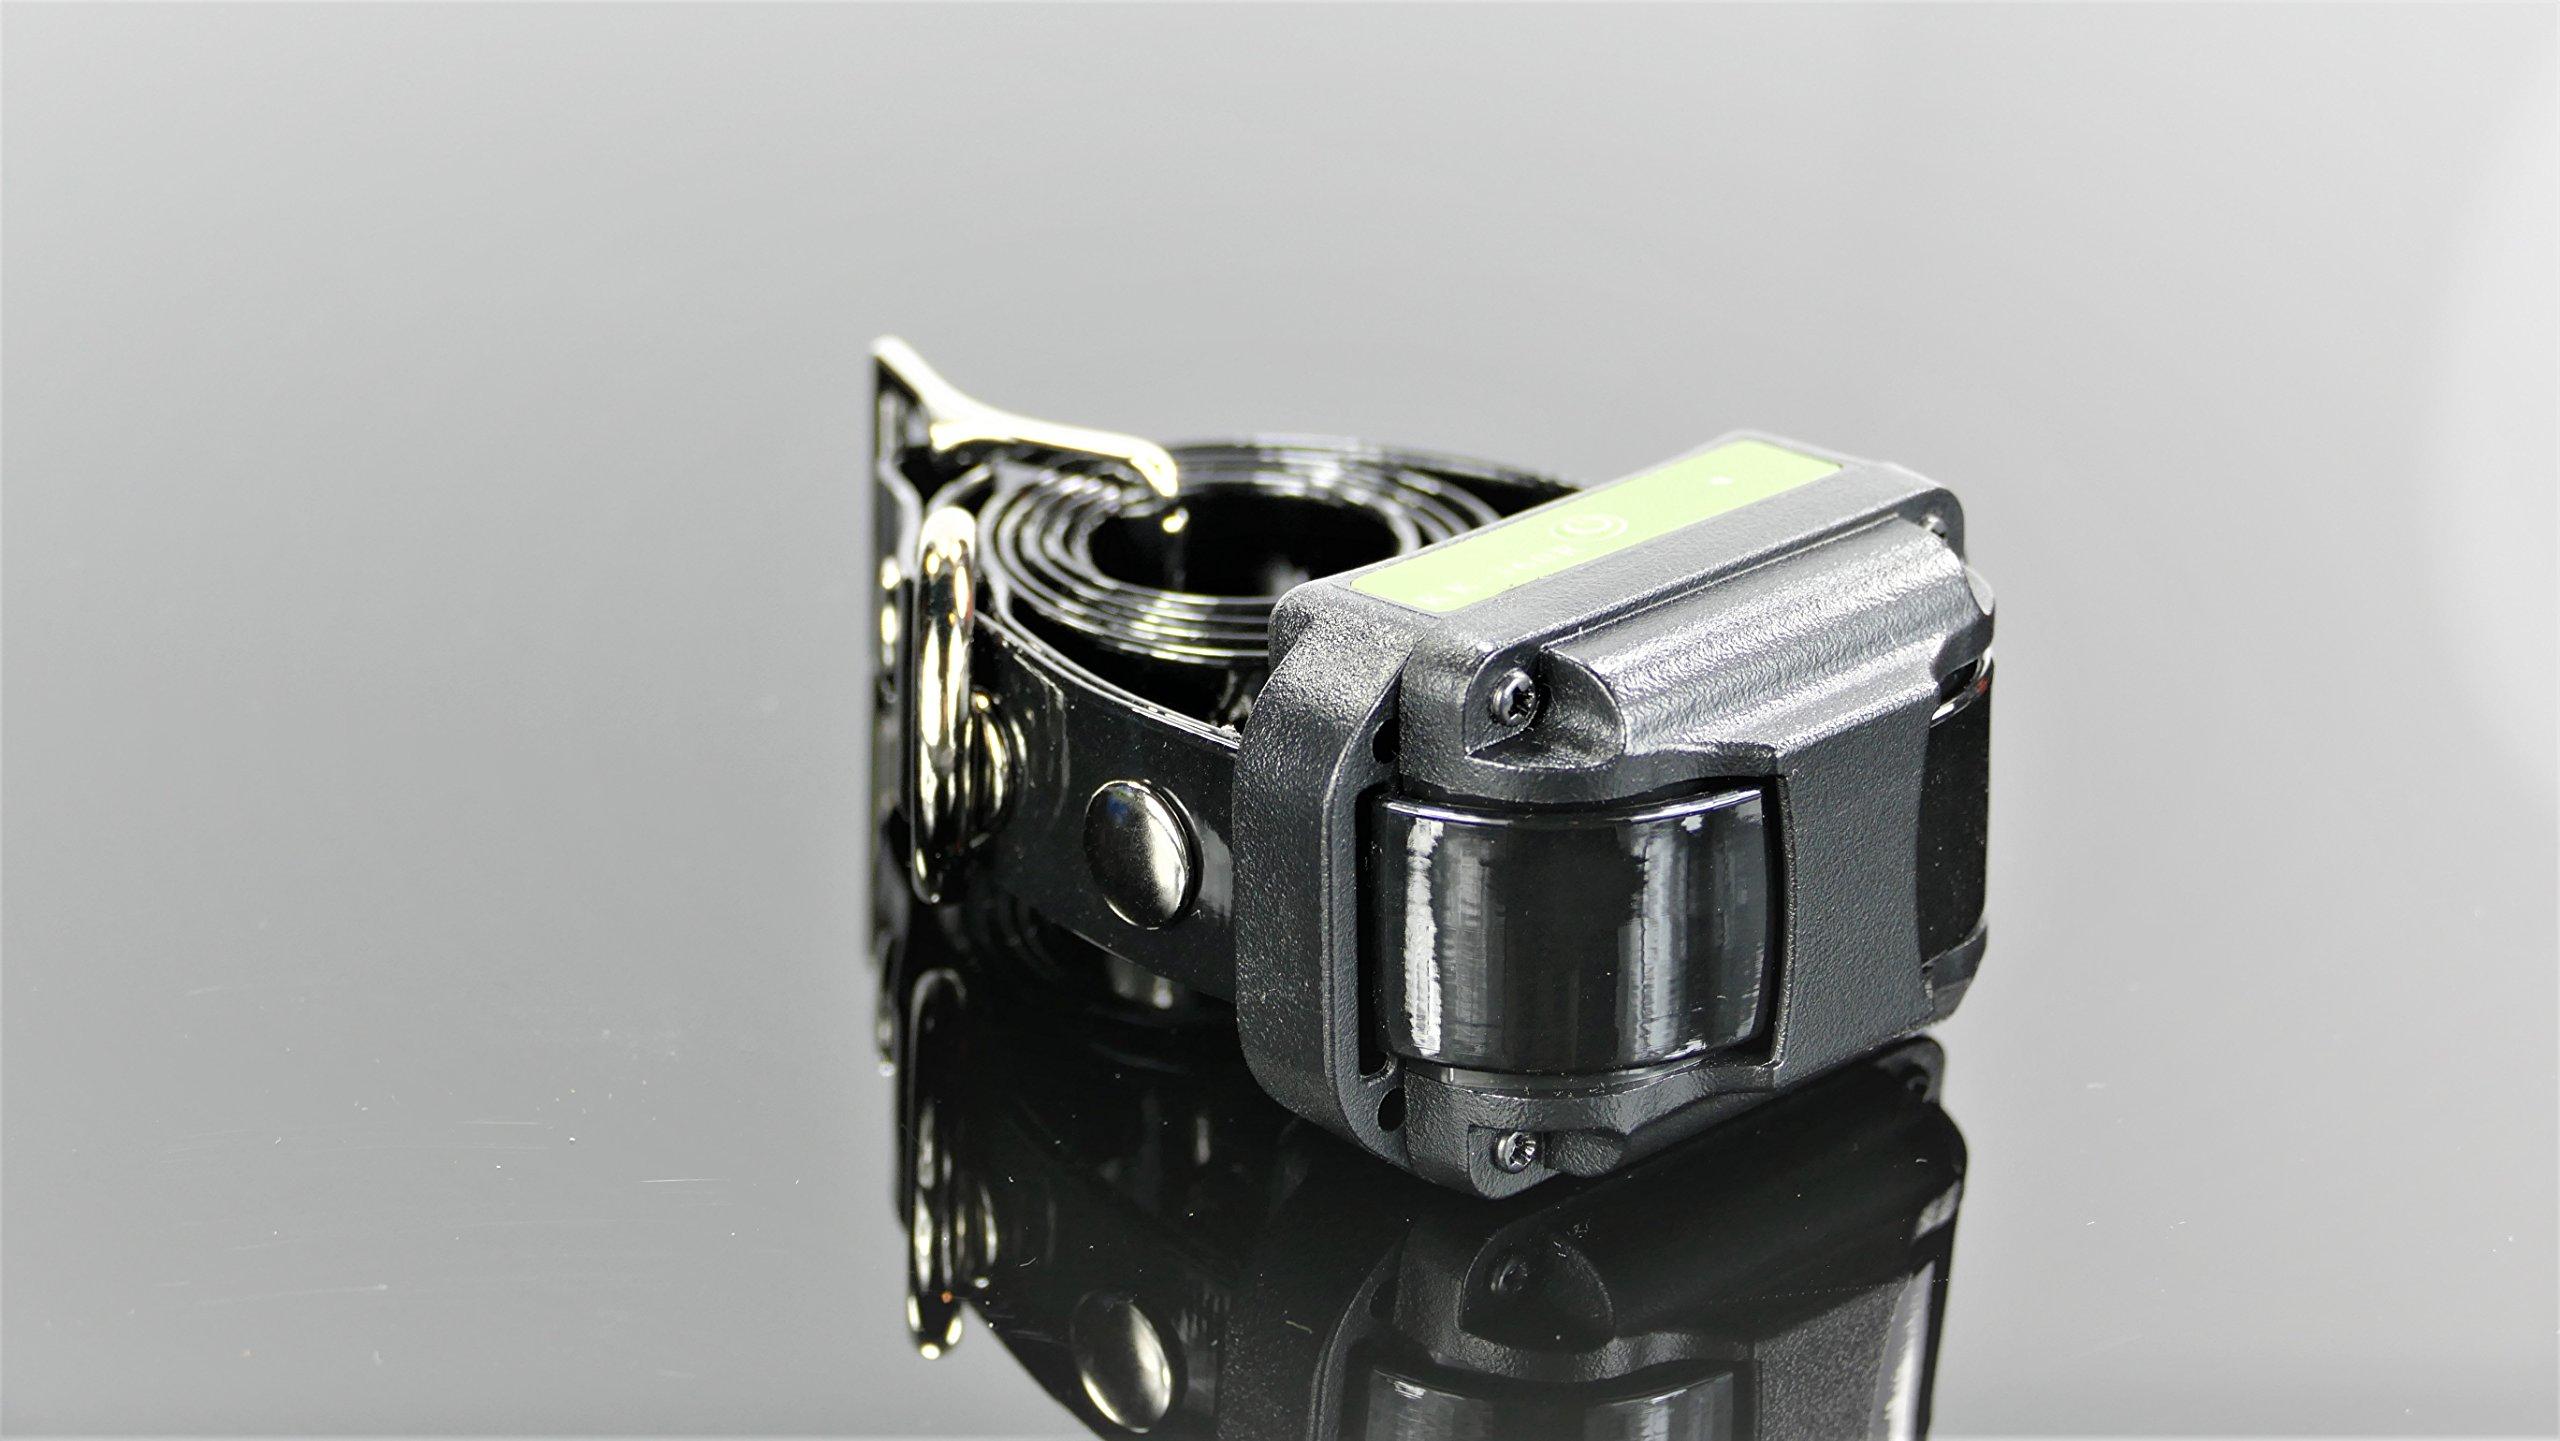 KoolKani Replacement/Spare Collar KK-360 Remote Dog Training Shock Collar System by KoolKani (Image #3)